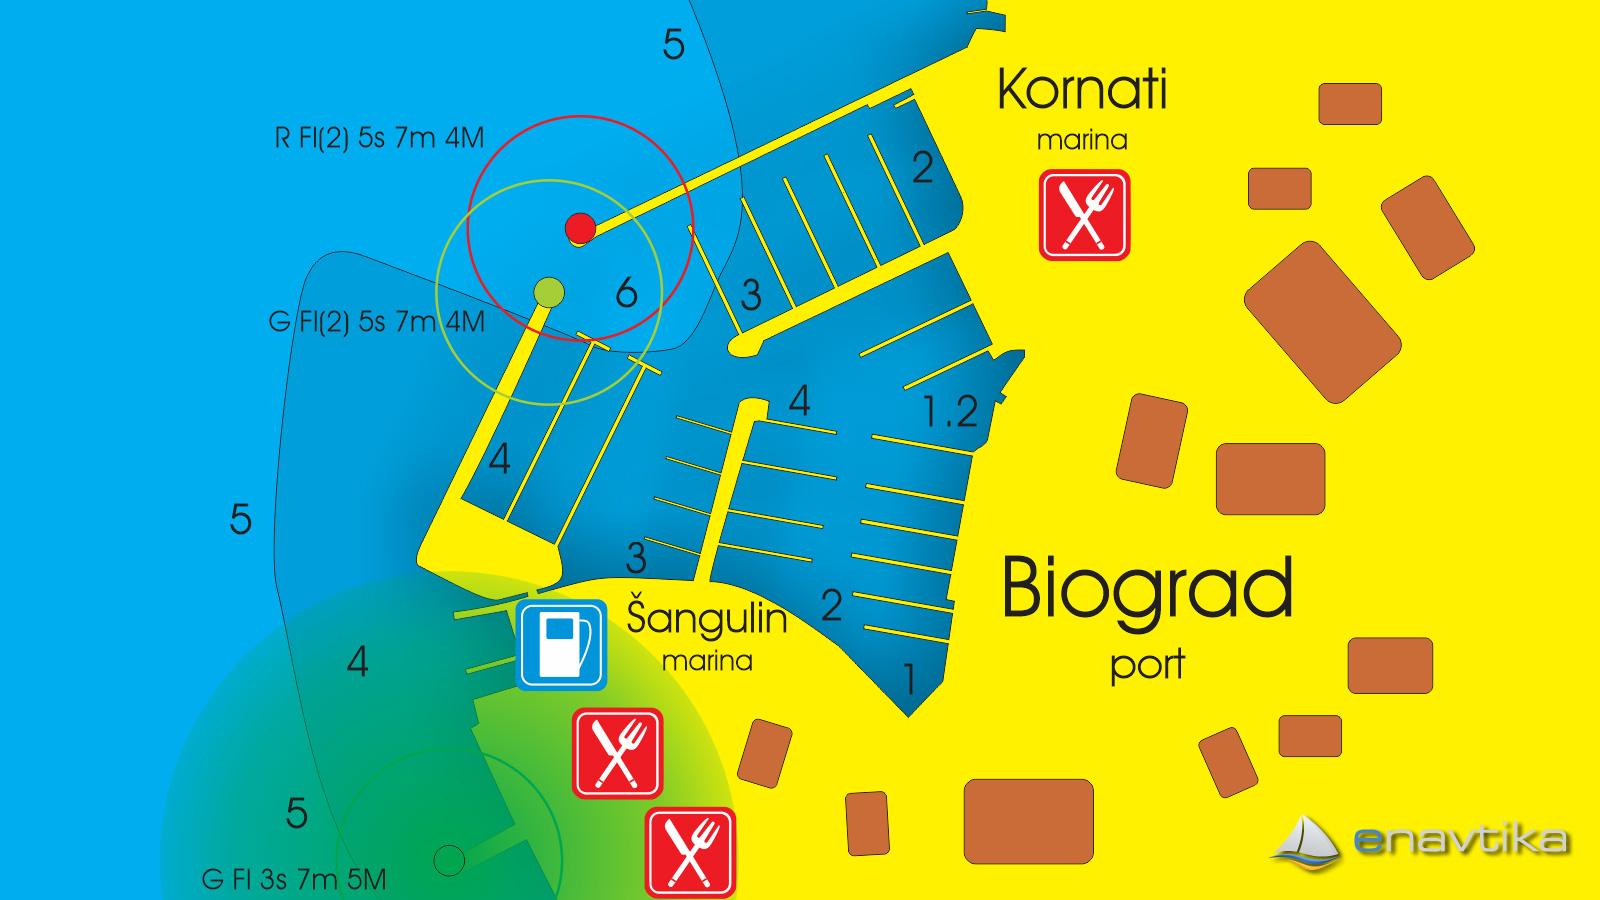 Slika Biograd E3185 2